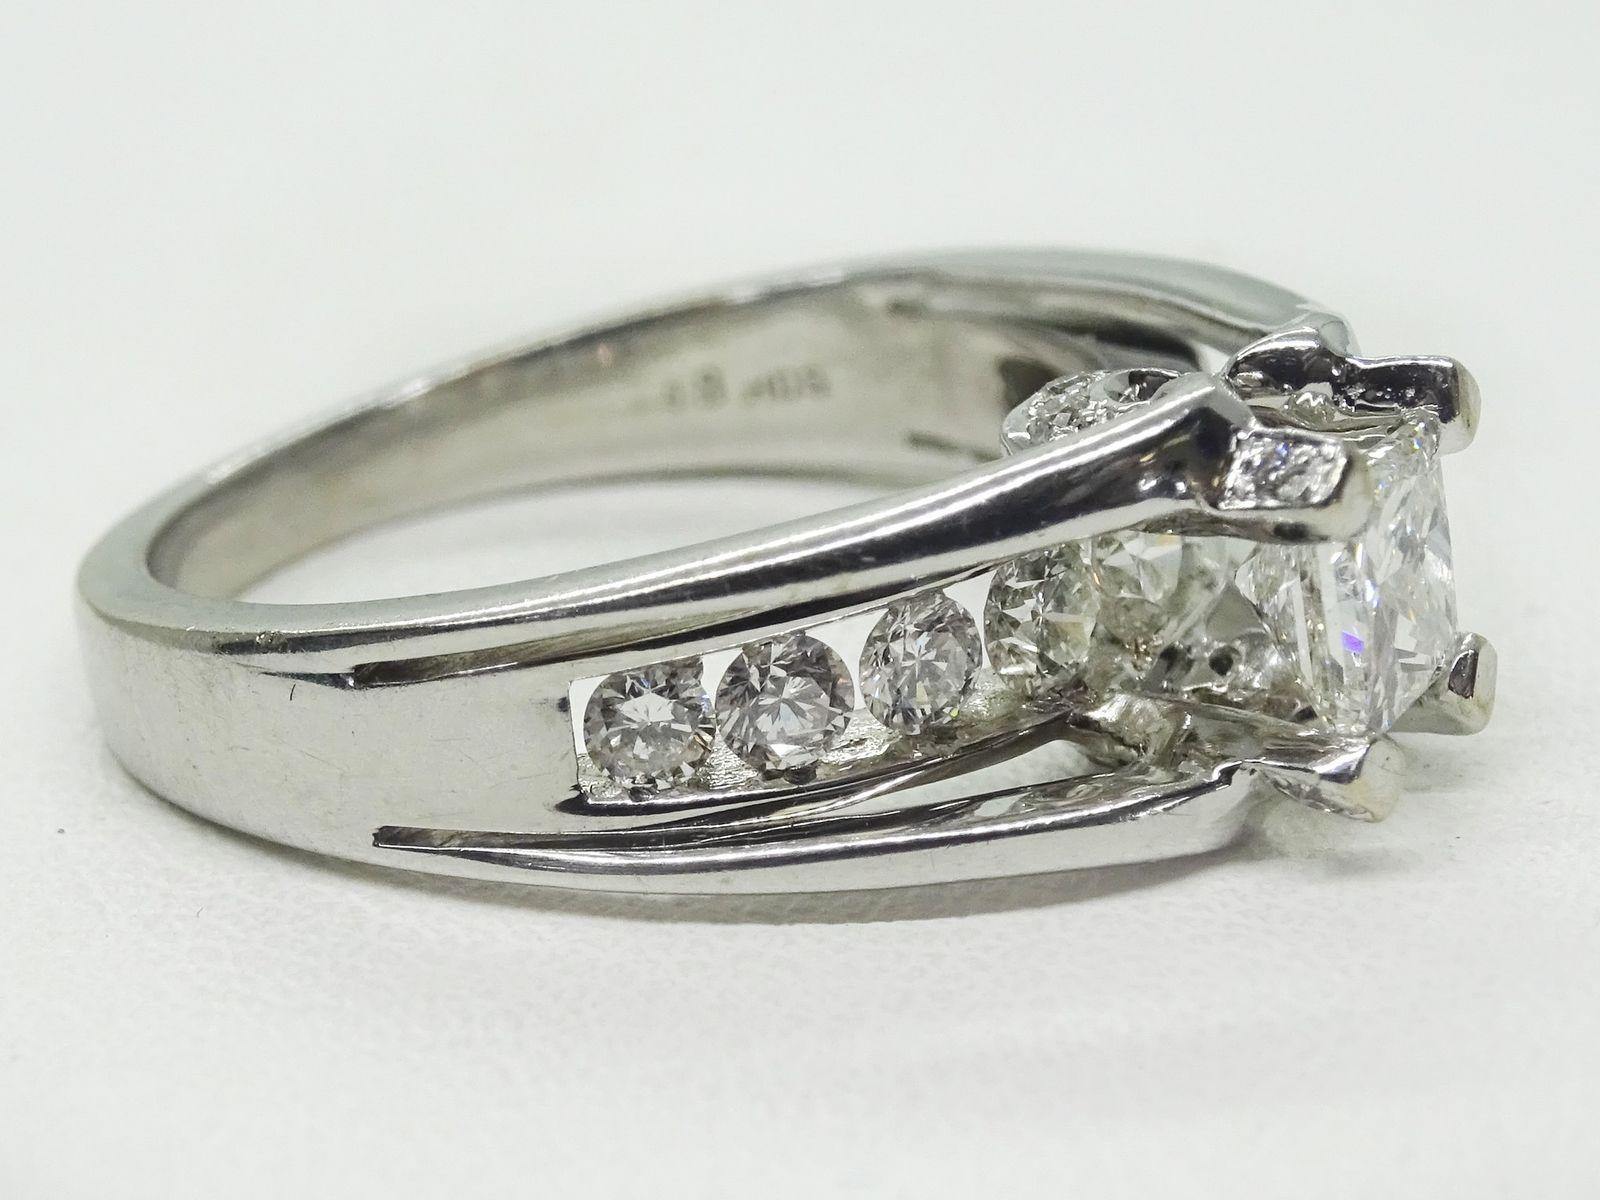 18k White Gold Princess Cut 1.00ct tw Helzberg Diamond Engagement Ring Size 6.5